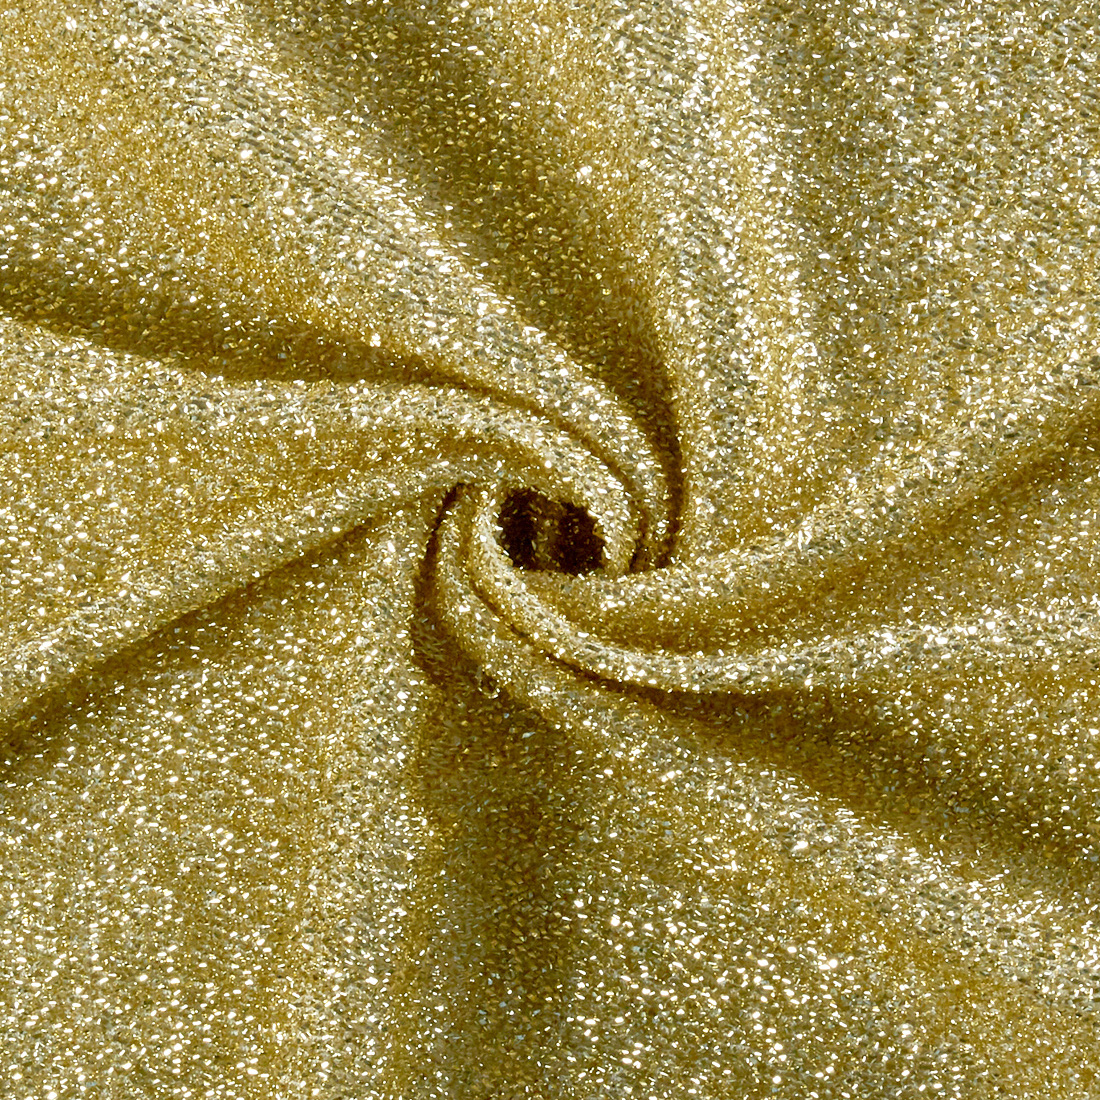 Xmas Glitter Fun Gold